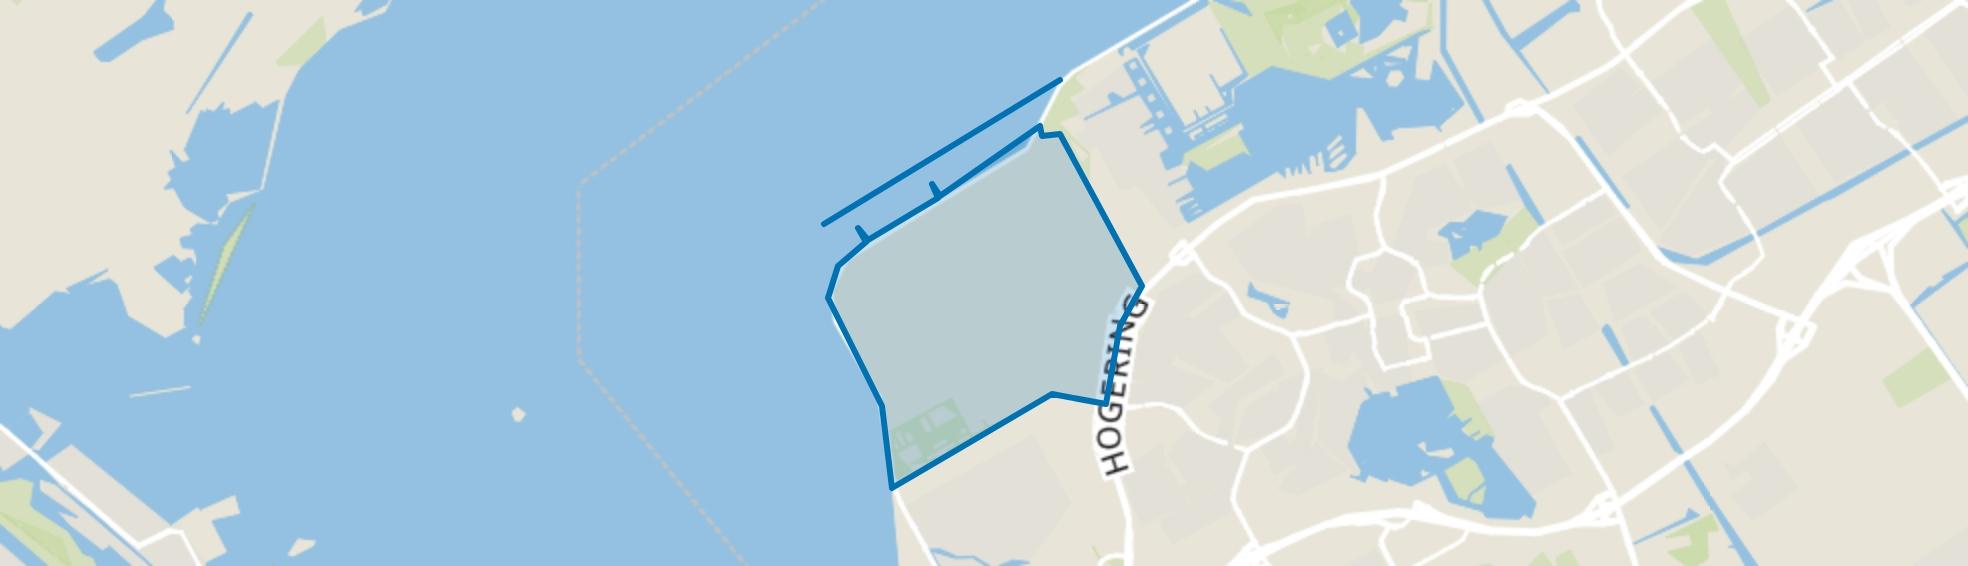 Overig Almere Pampus, Almere map